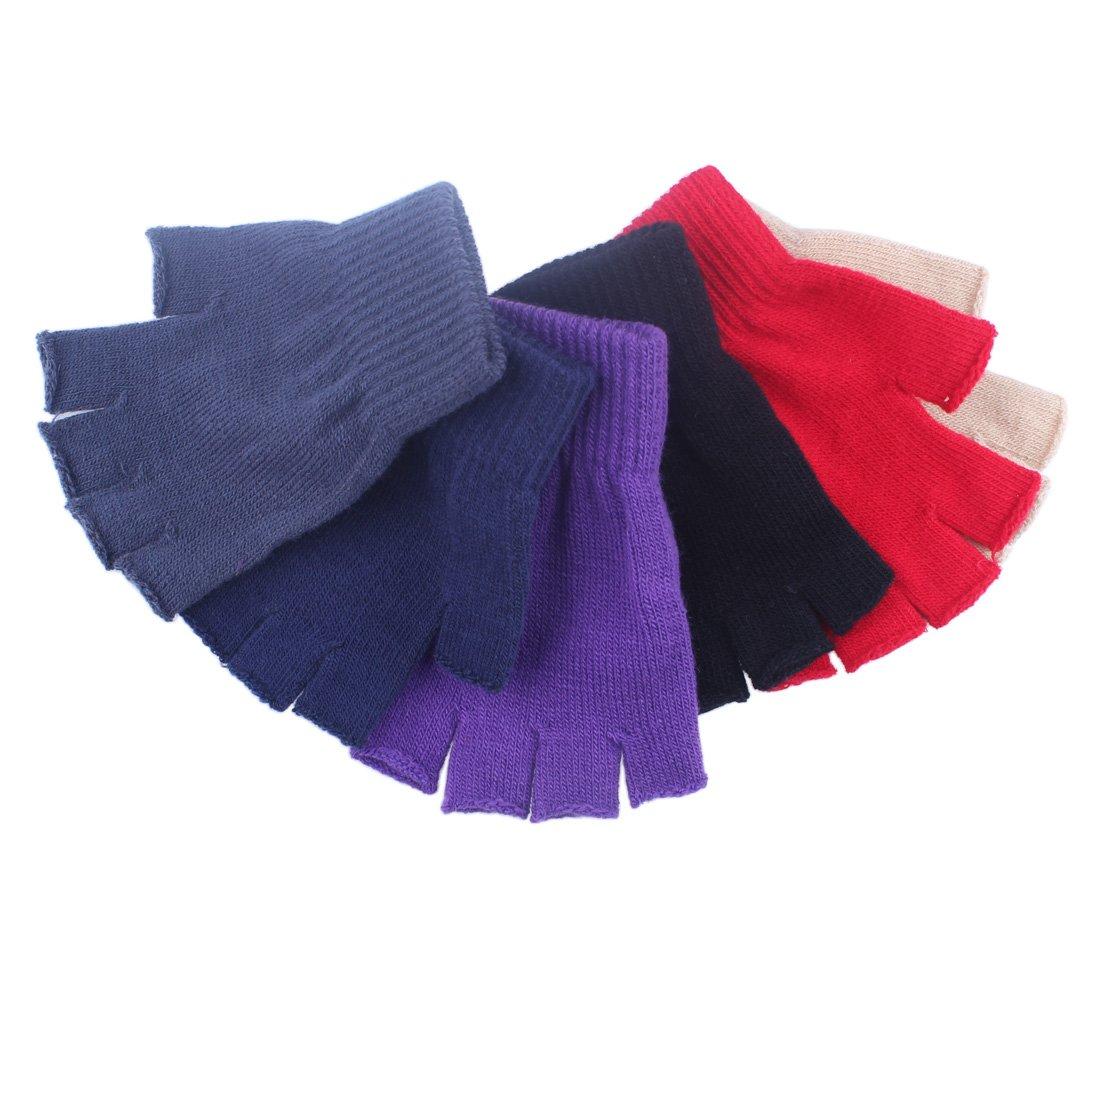 Kids Child little Girl Boy Winter Wool Knitted Gloves ZJDZ1794-7